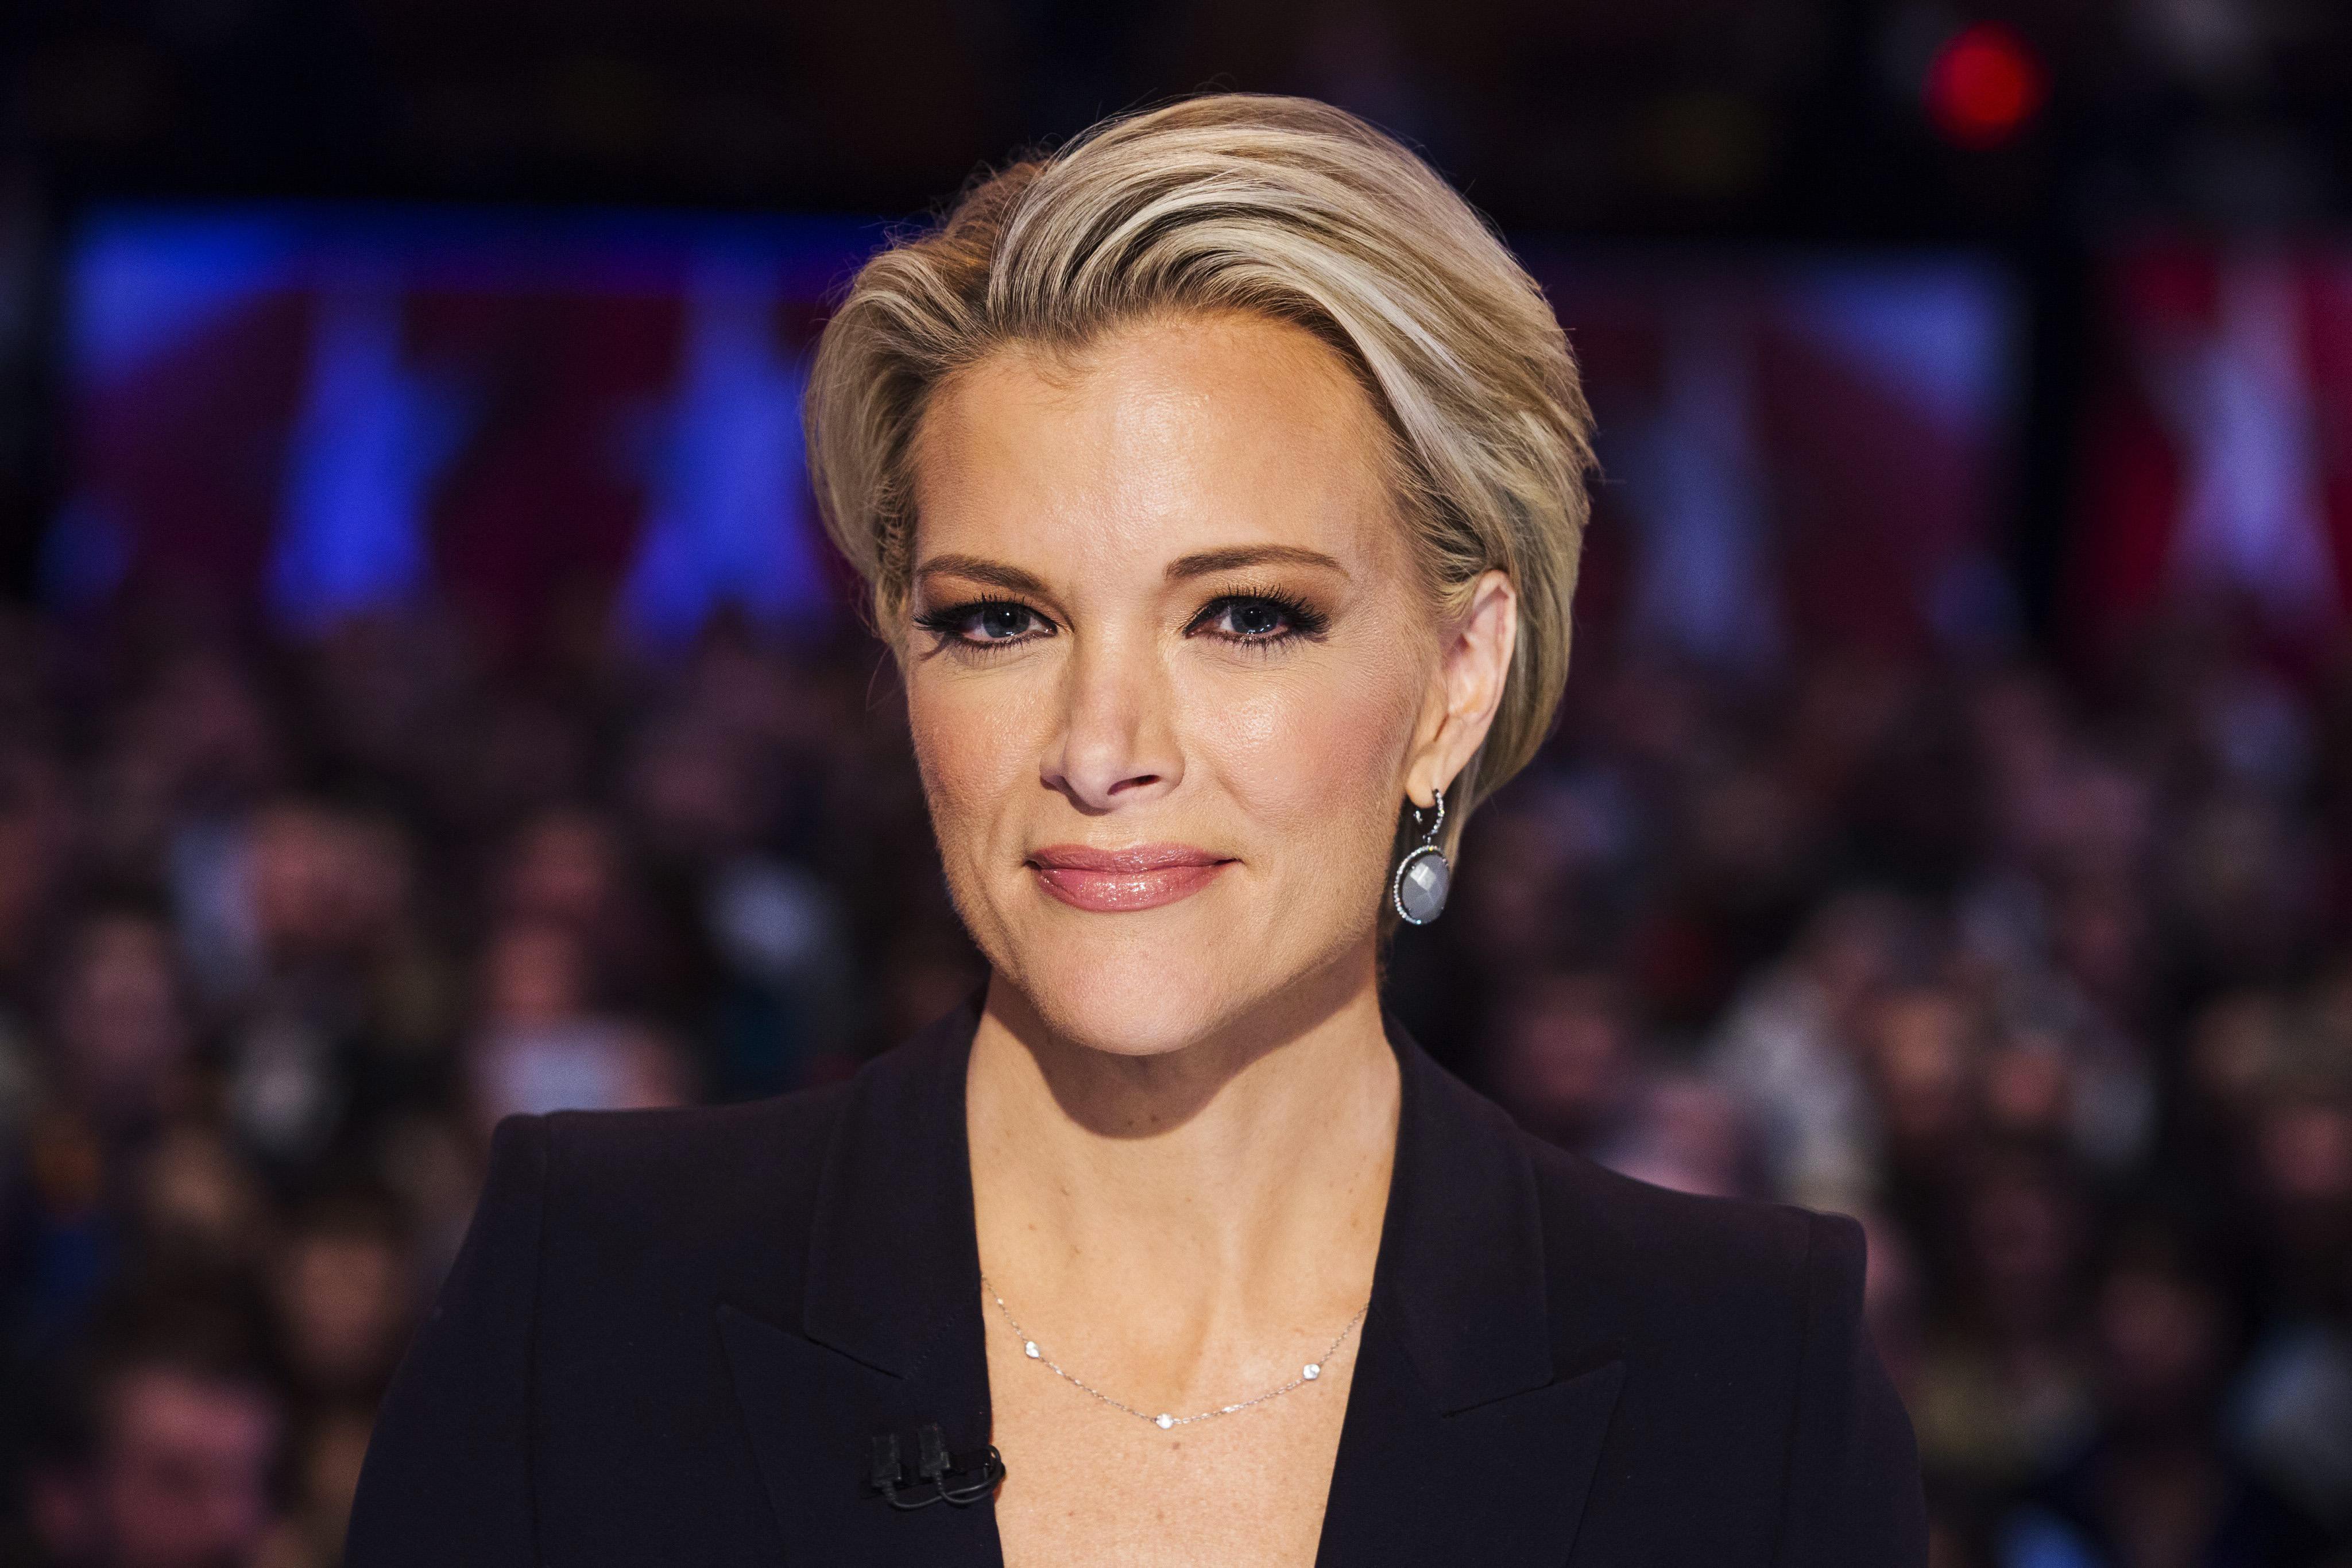 Fox News debate moderator Megyn Kelly at the Republican presidential debate Thursday, Jan. 28, 2016, in Des Moines, Iowa.